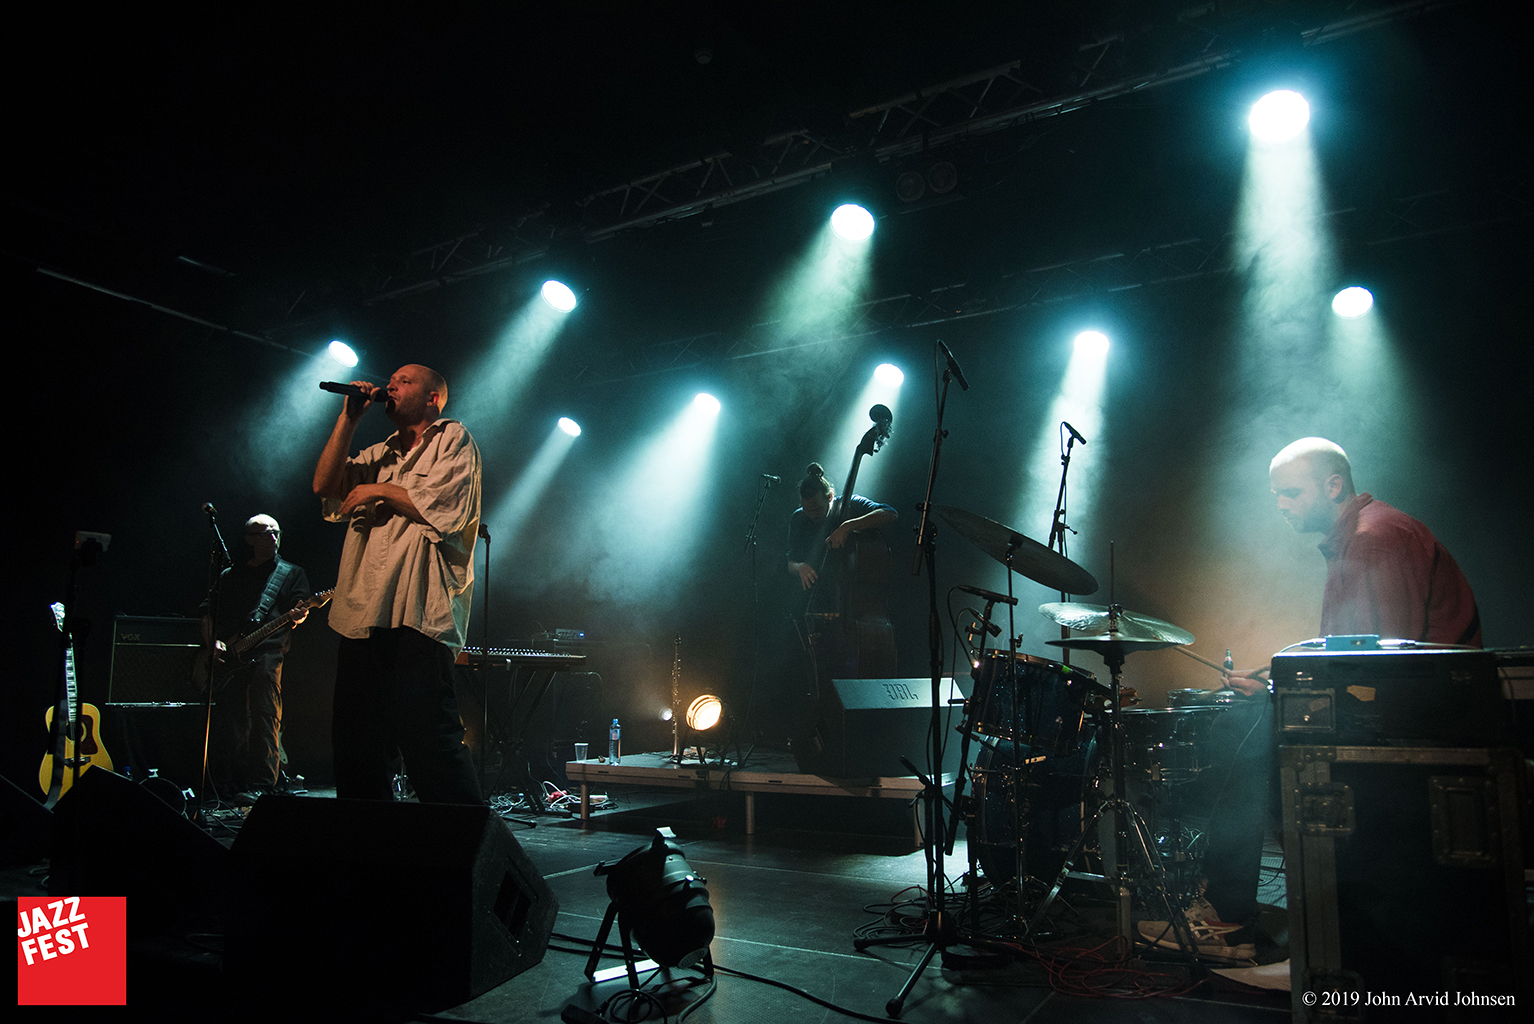 Trond Wiger med band i Verkstedhallen. Foto: John Arvid Johnsen